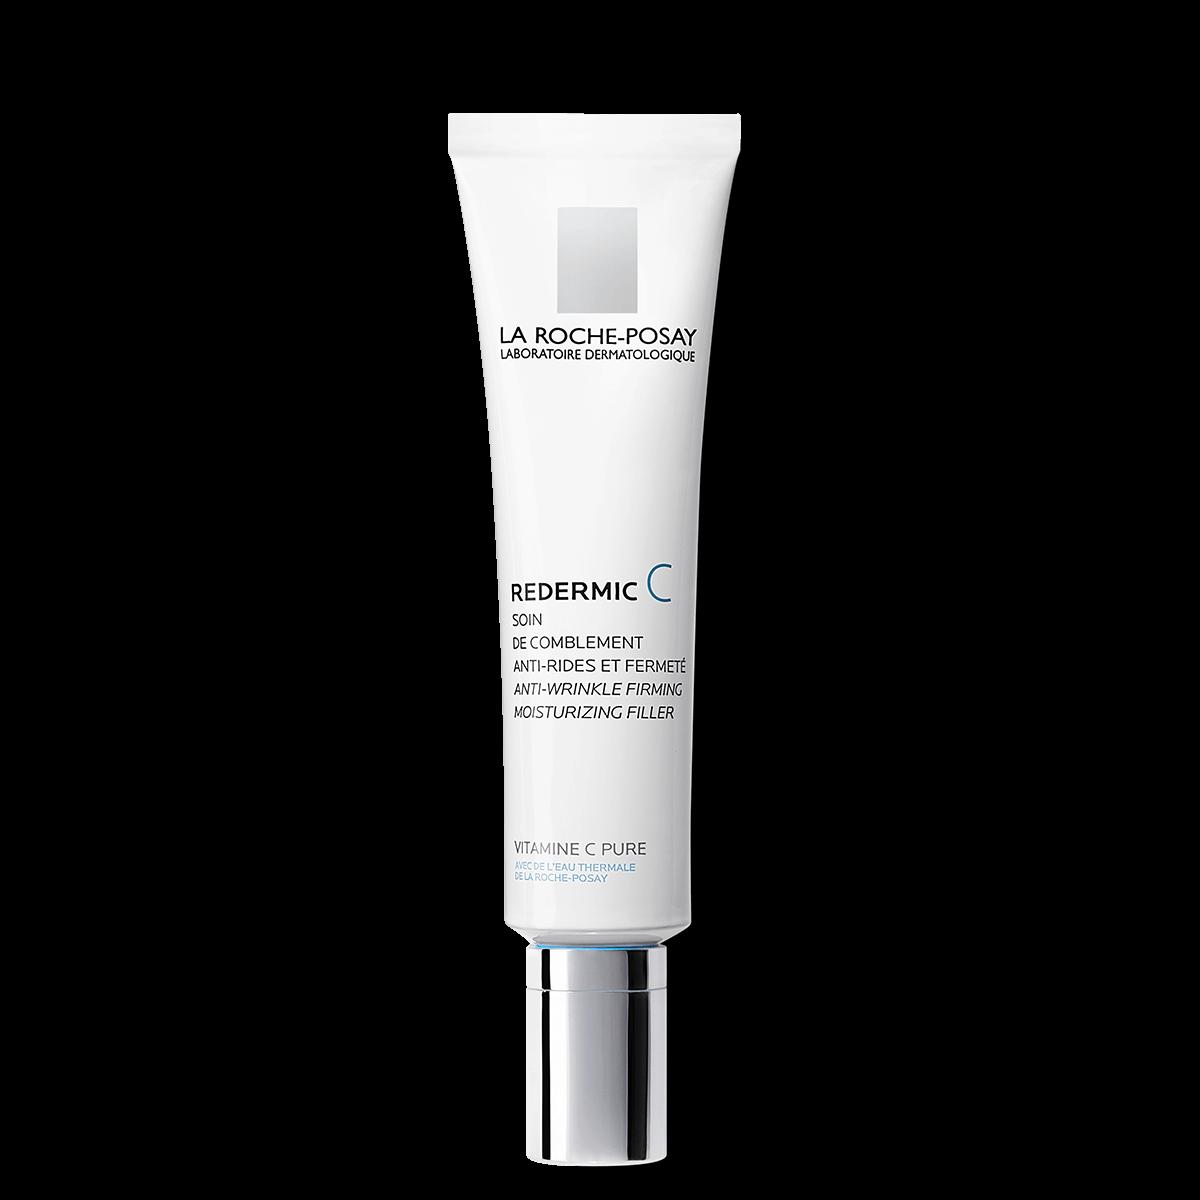 La Roche Posay ProductPage Anti Aging Cream Redermic C Anti Wrinkle Fi